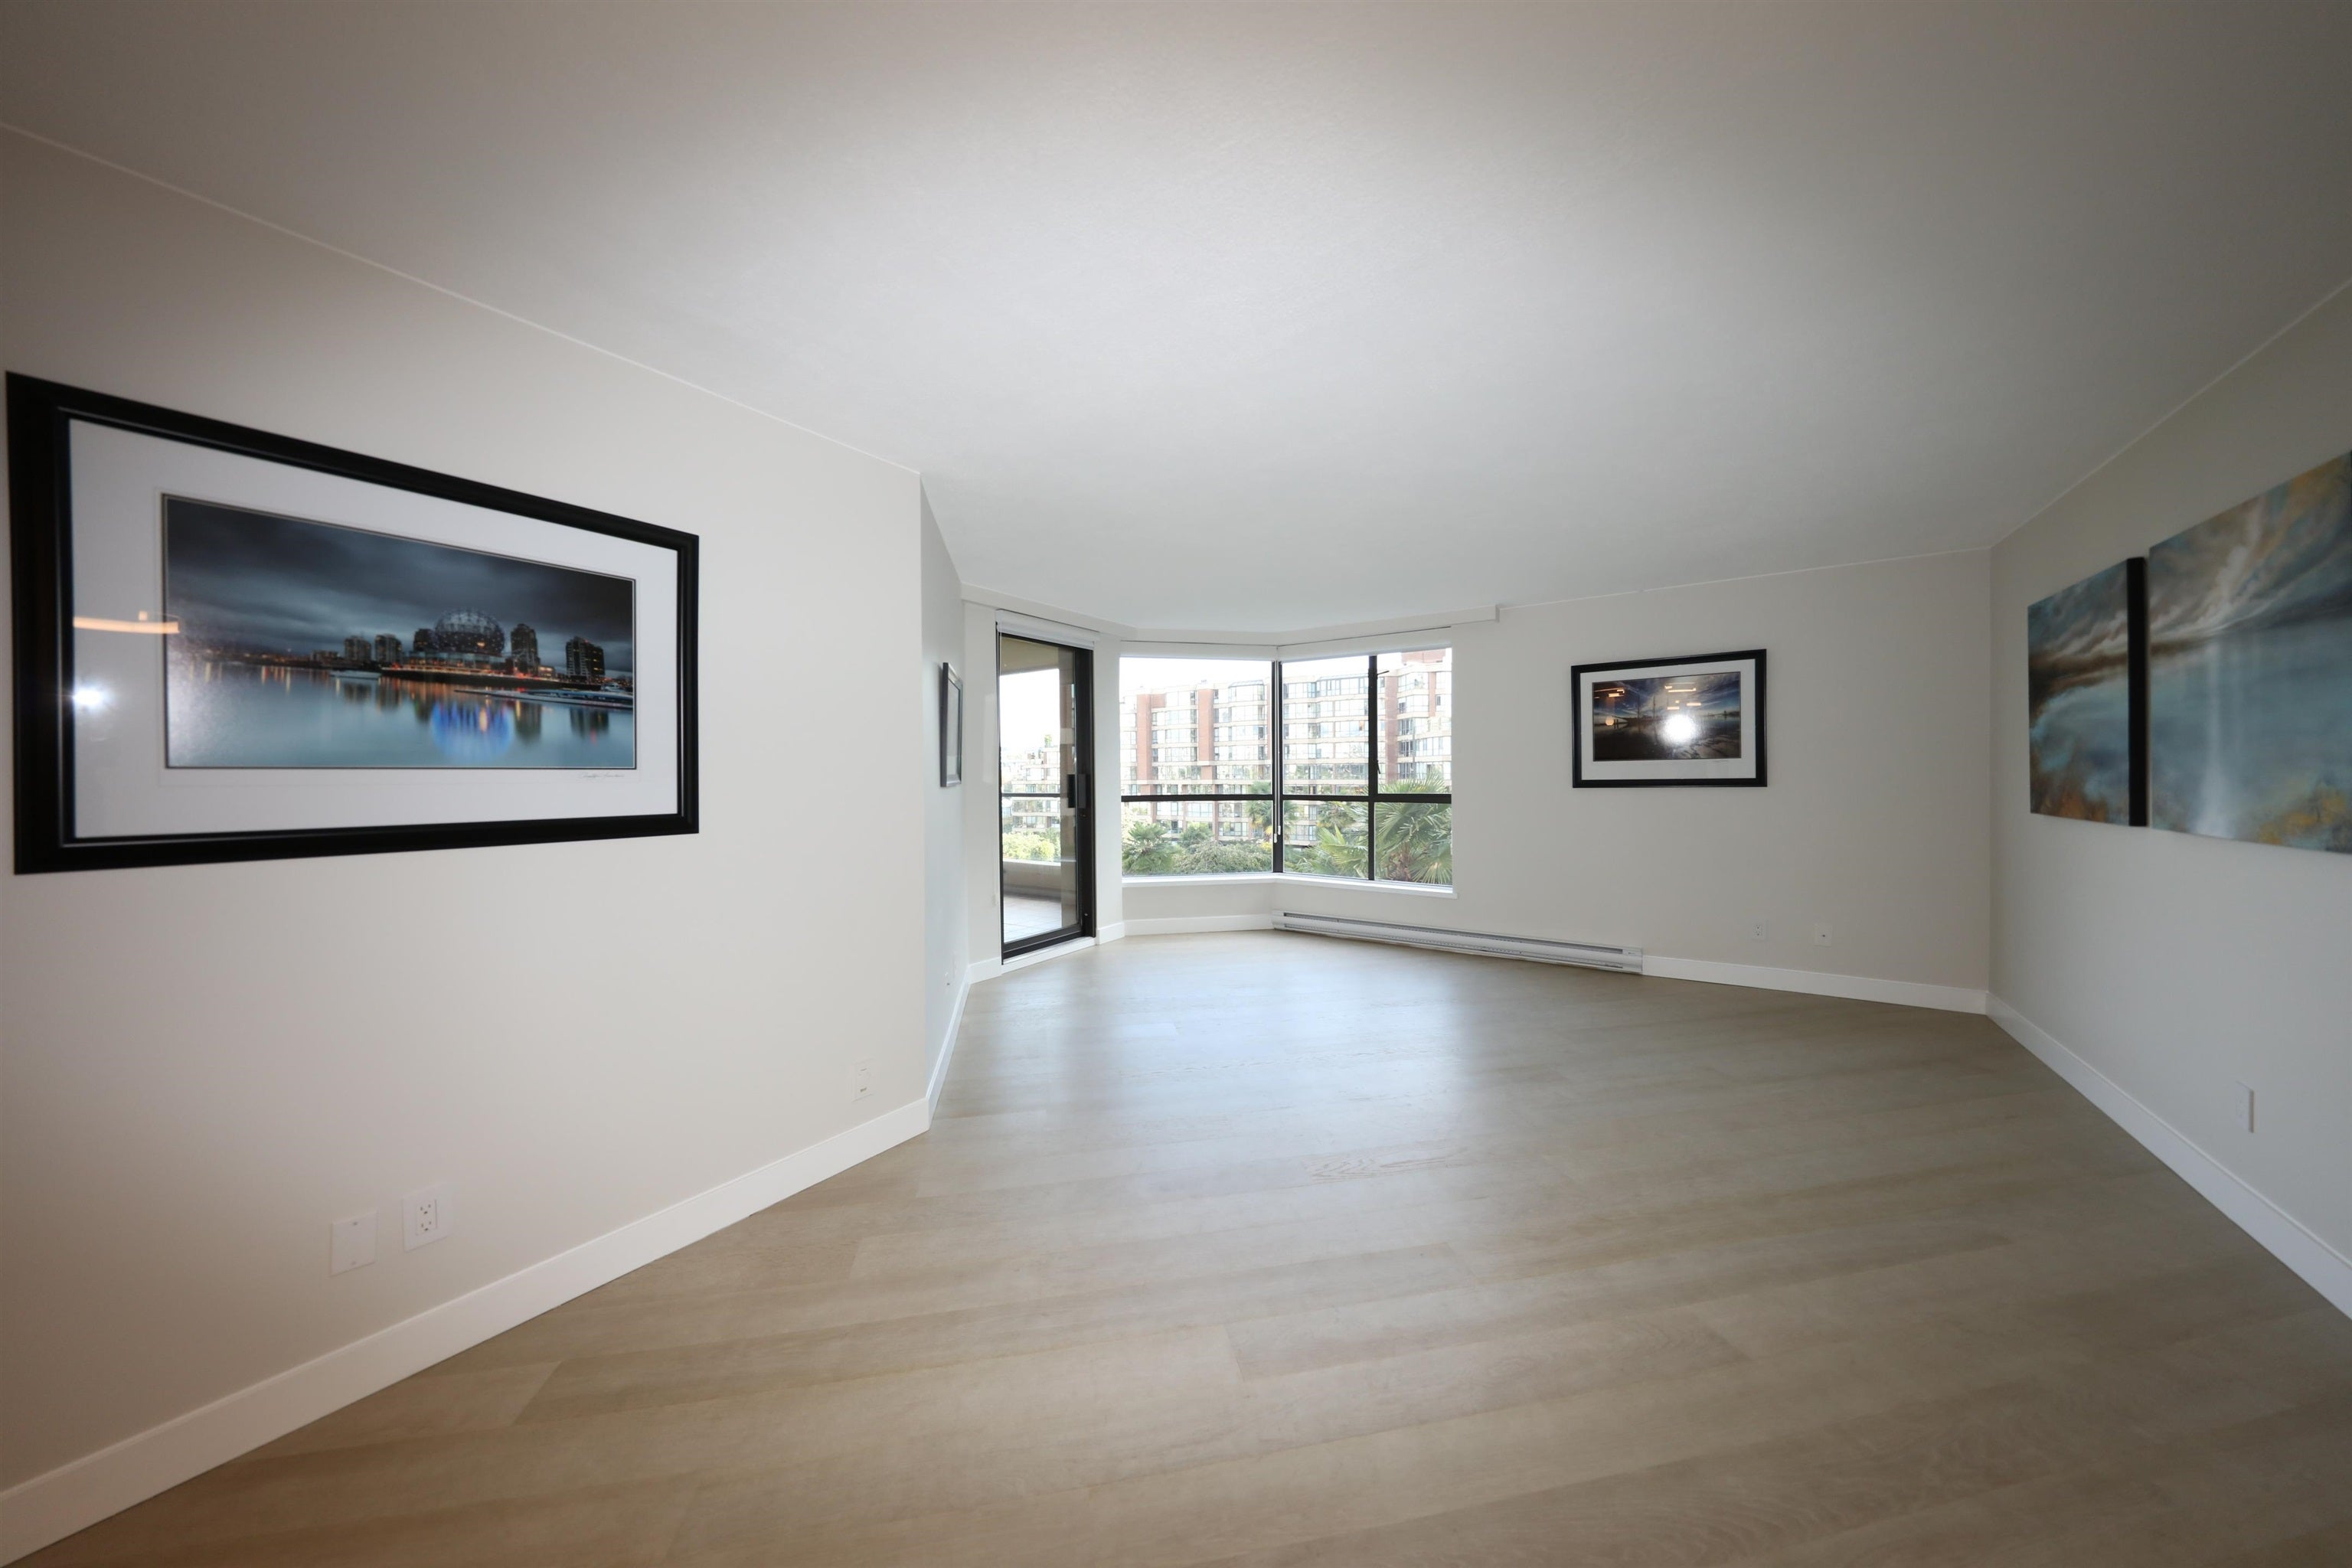 406 1450 PENNYFARTHING DRIVE - False Creek Apartment/Condo for sale, 2 Bedrooms (R2617259) - #30